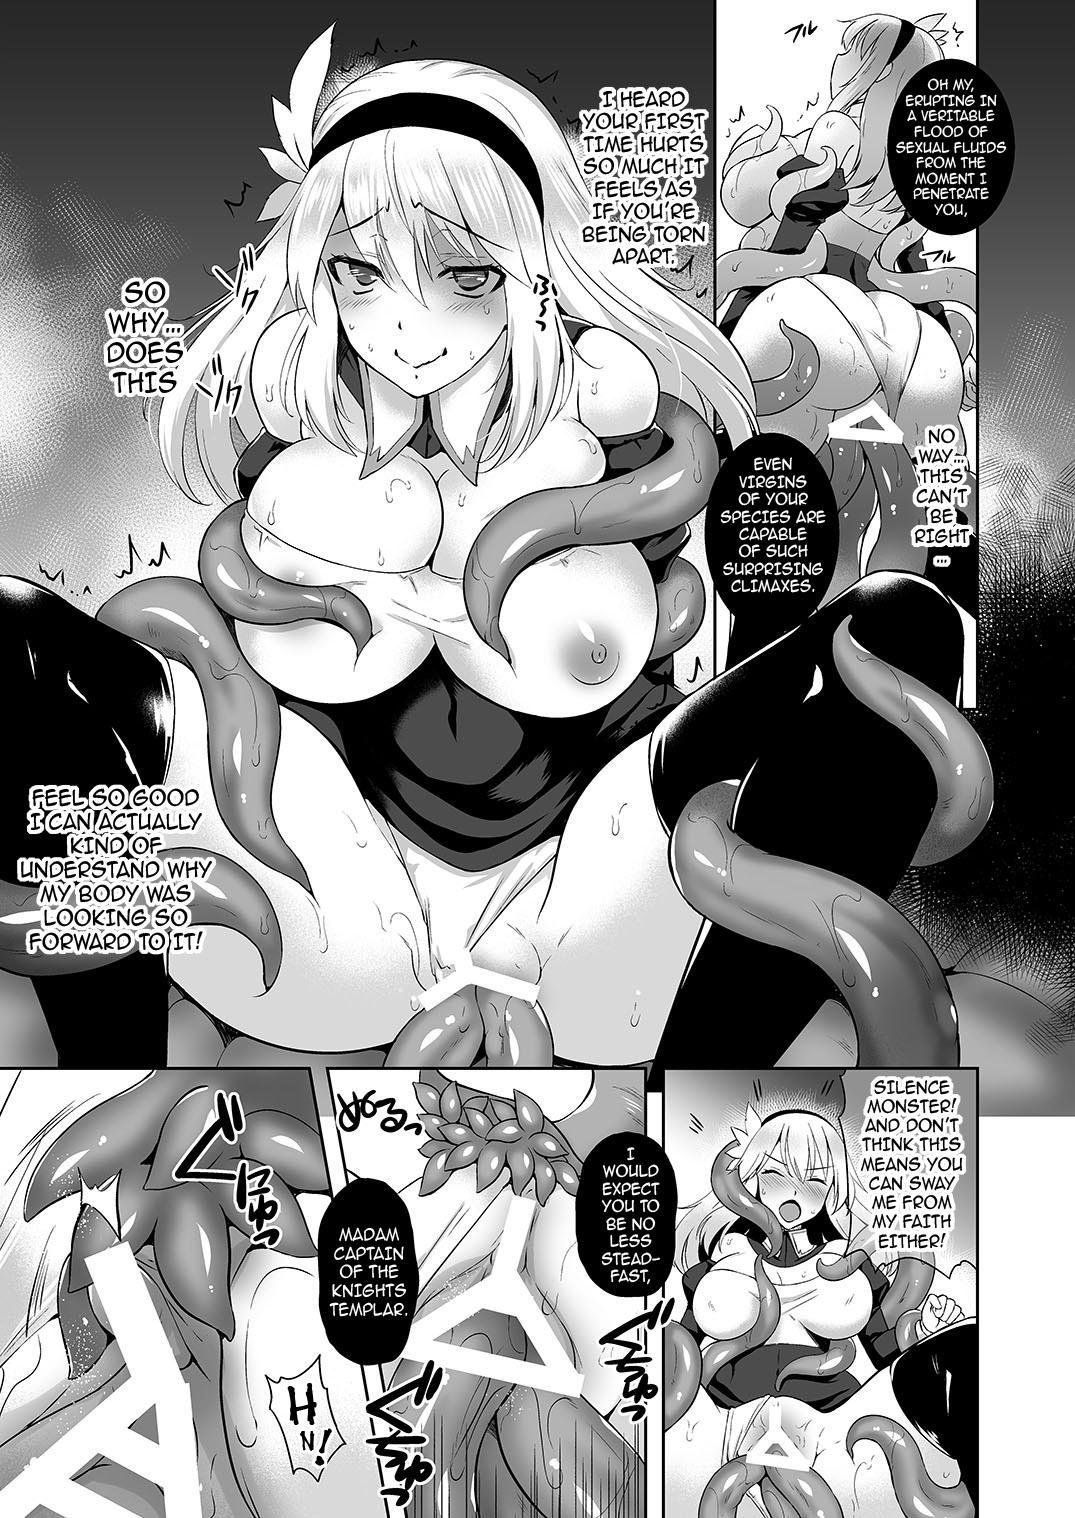 [Chococornet (Tenro Aya)] Falling - Mashoku no Sennou Dorei   Falling - Brainwashed Slave of the Great Wurm [English] {darknight} [Digital] 9